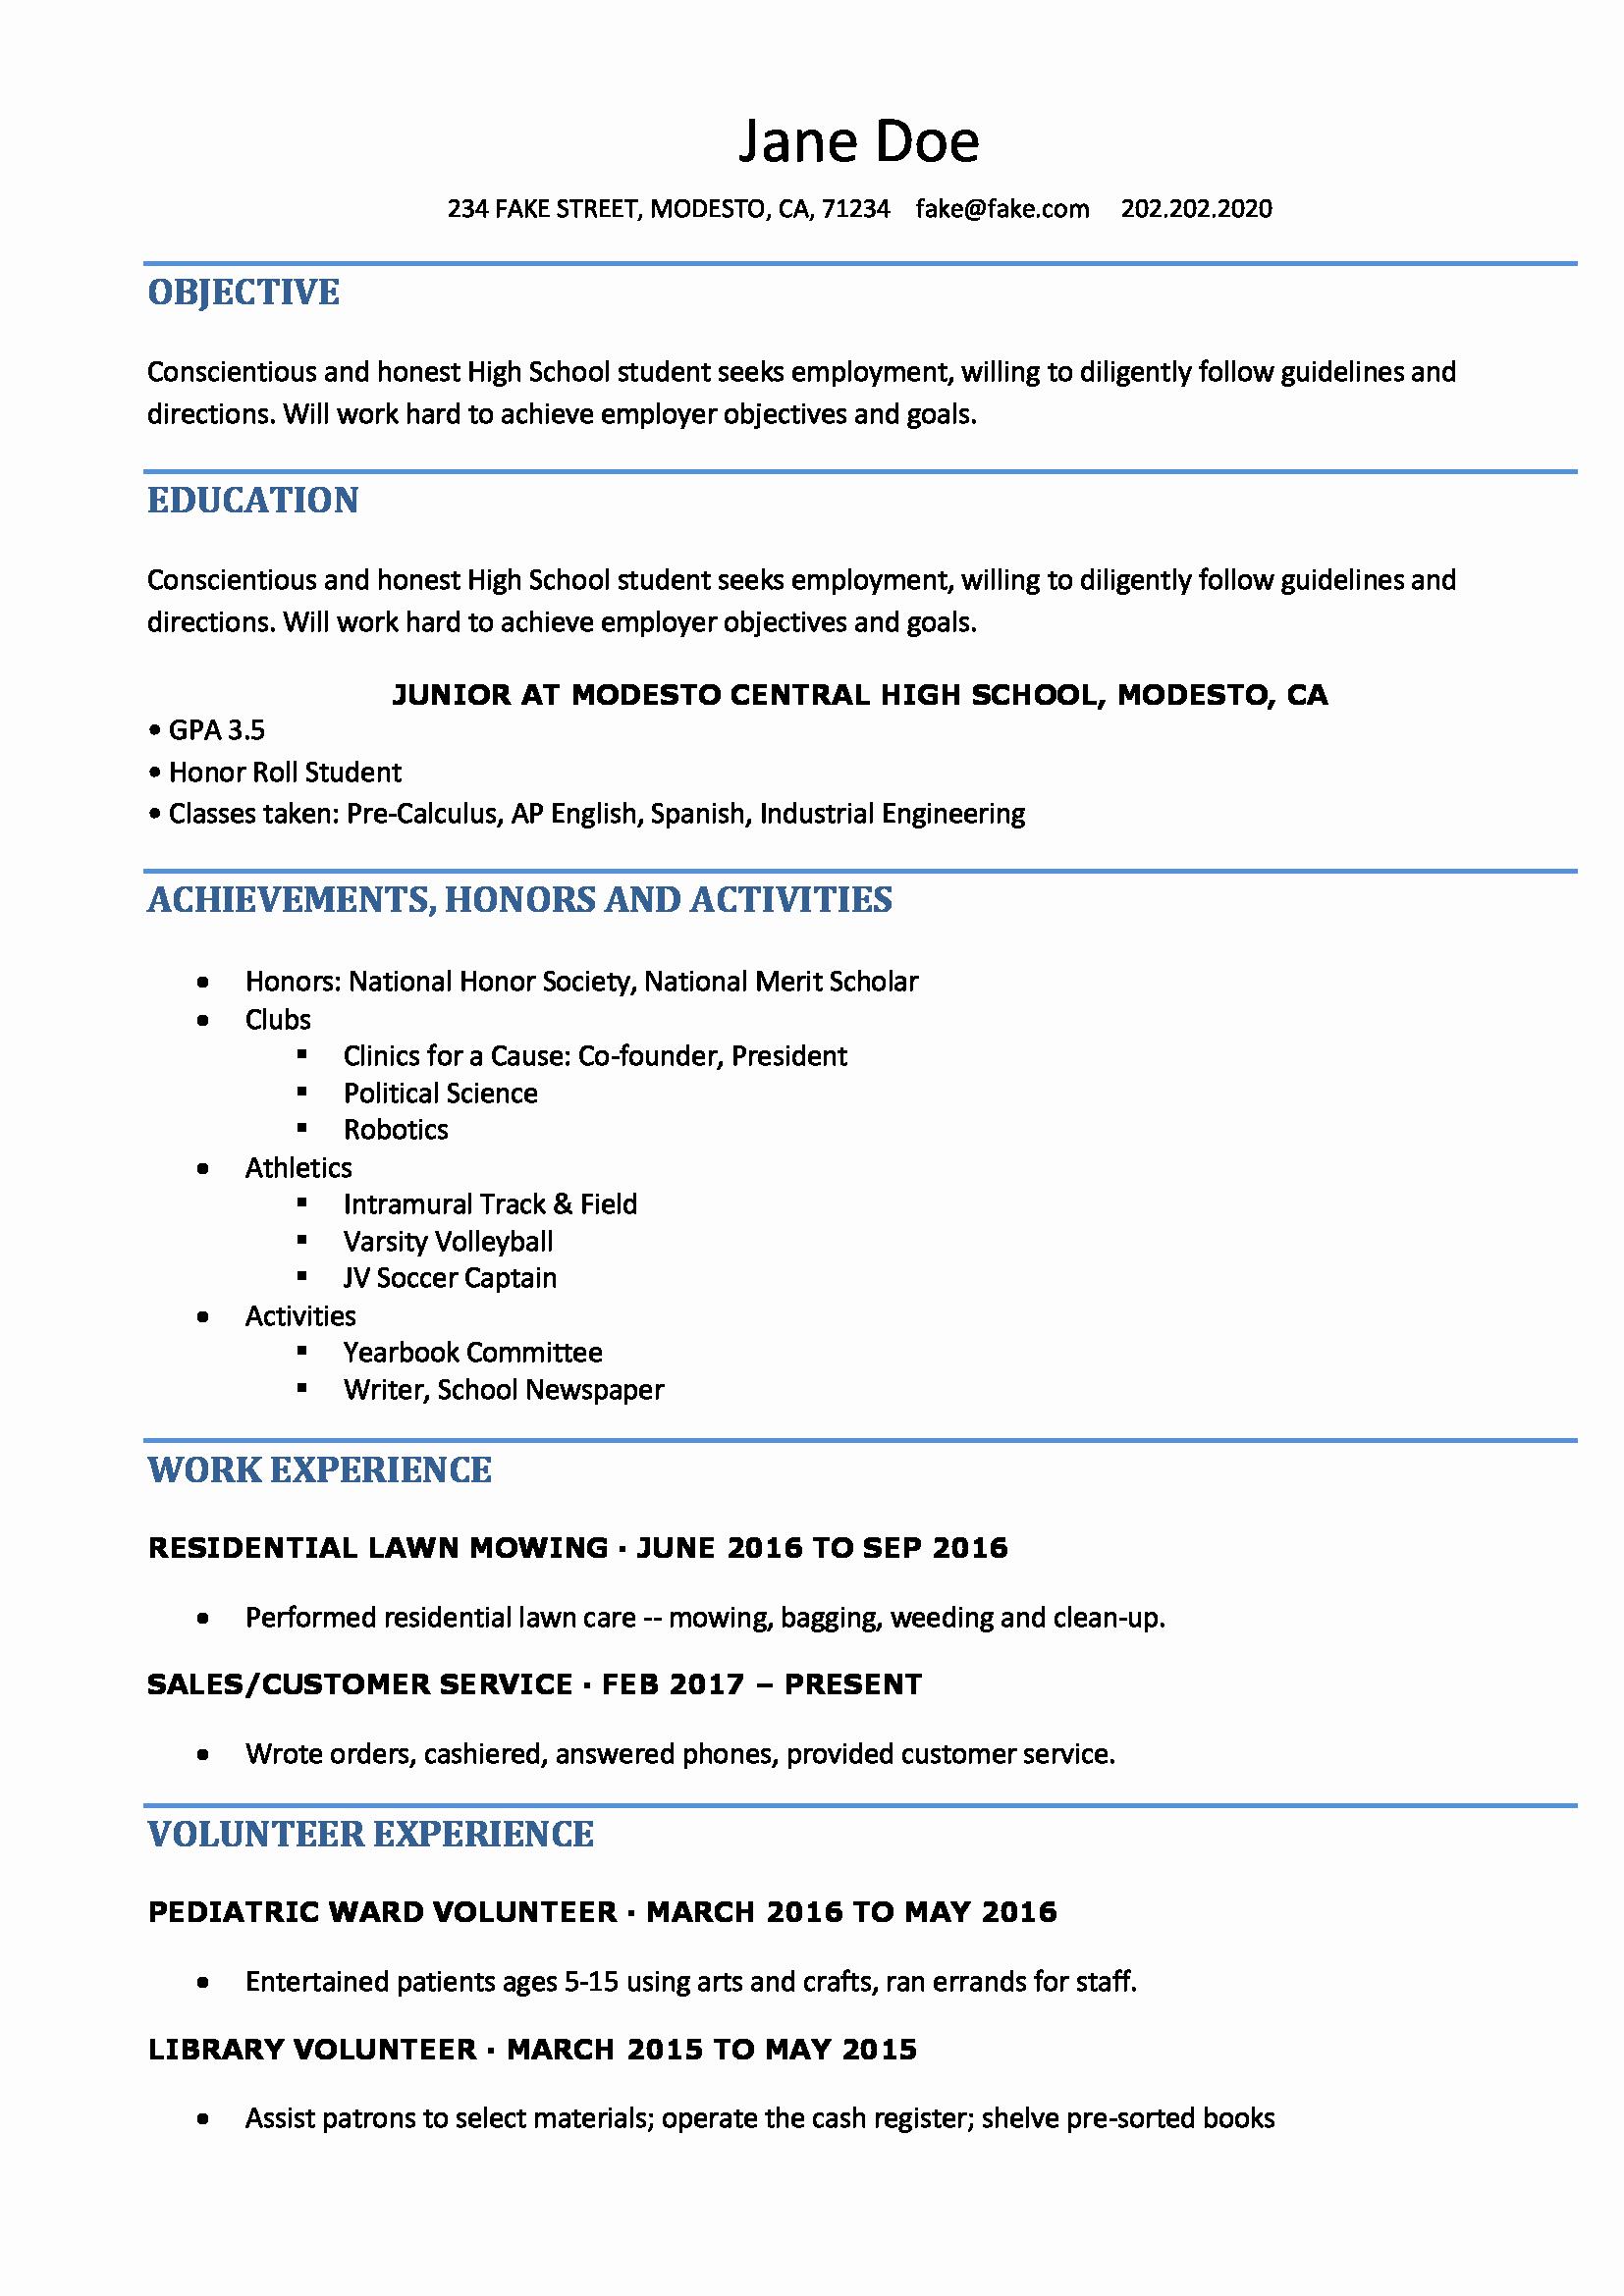 Resume High School Student New High School Resume Resumes Perfect for High School Students